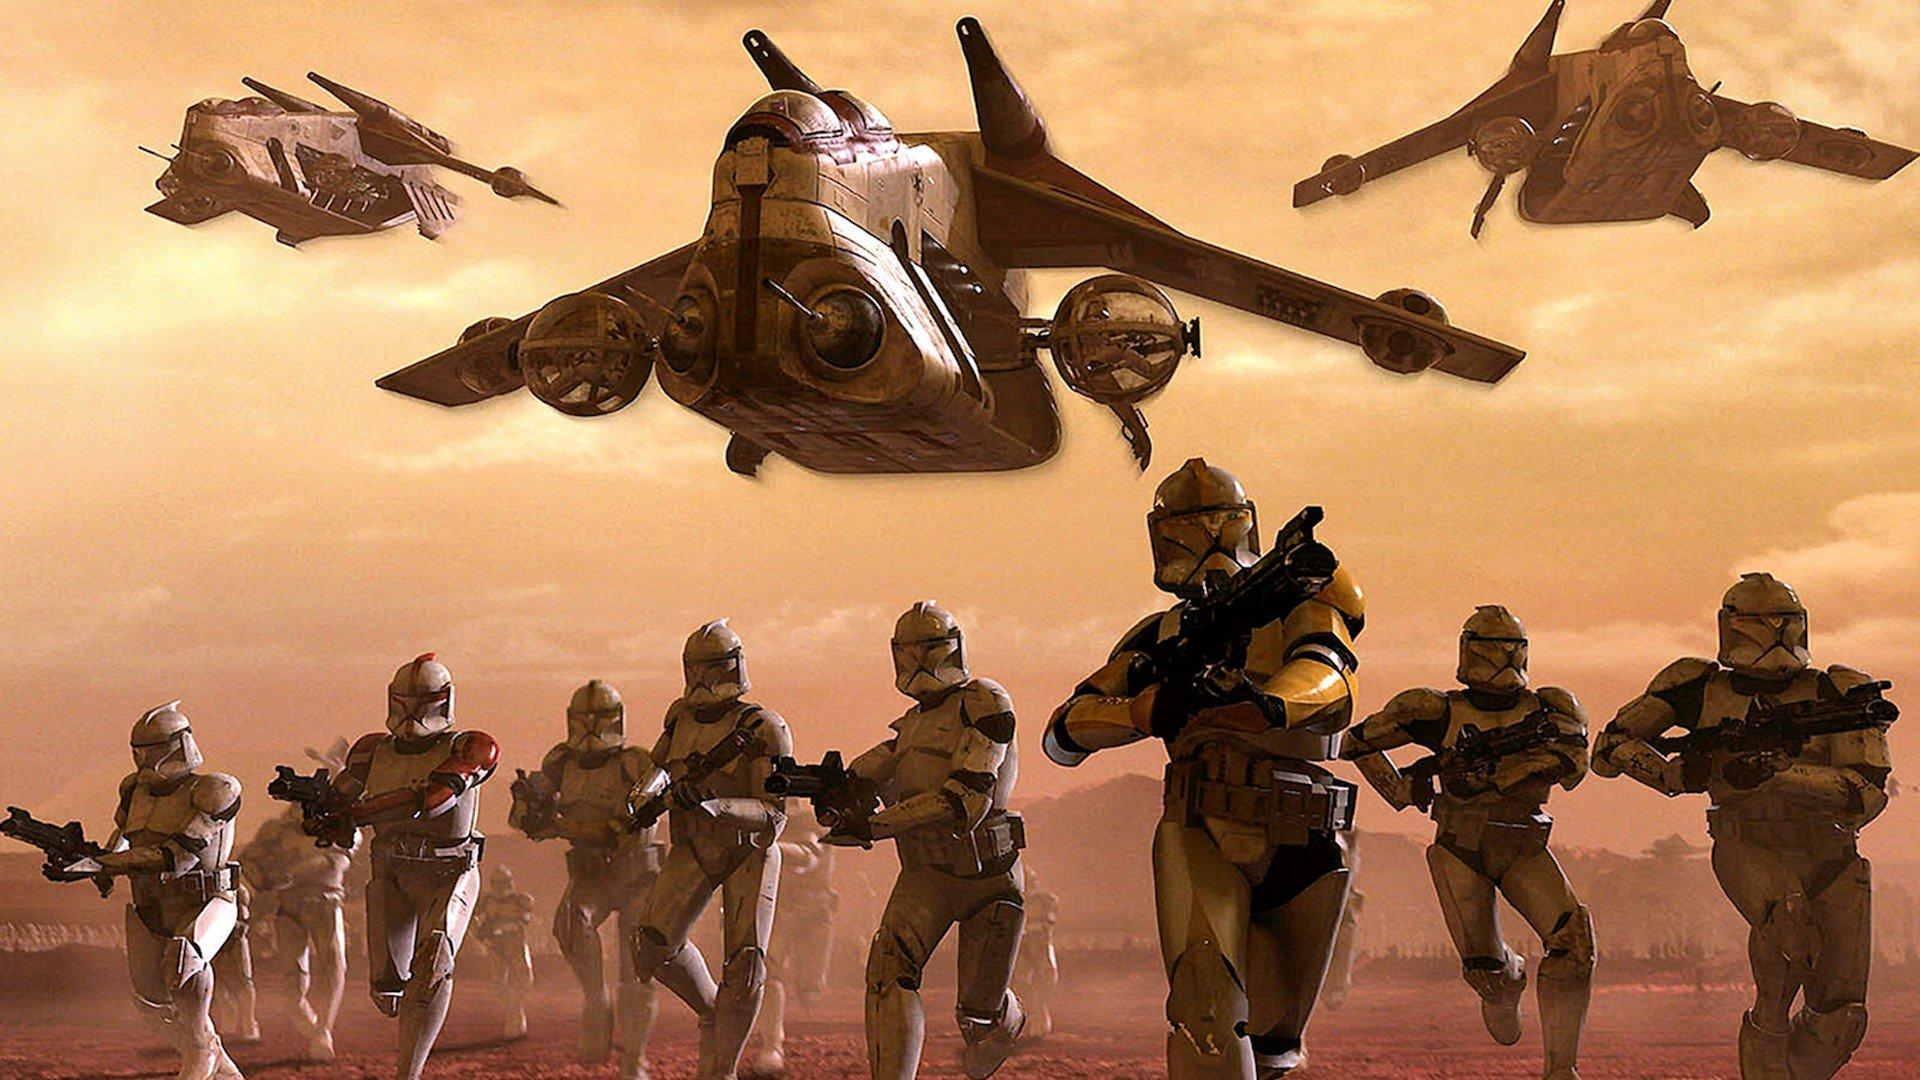 Star Wars Episode 2 Ii Attack Of The Clones Wallpapers 1920x1080 Full Hd 1080p Desktop Backgrounds